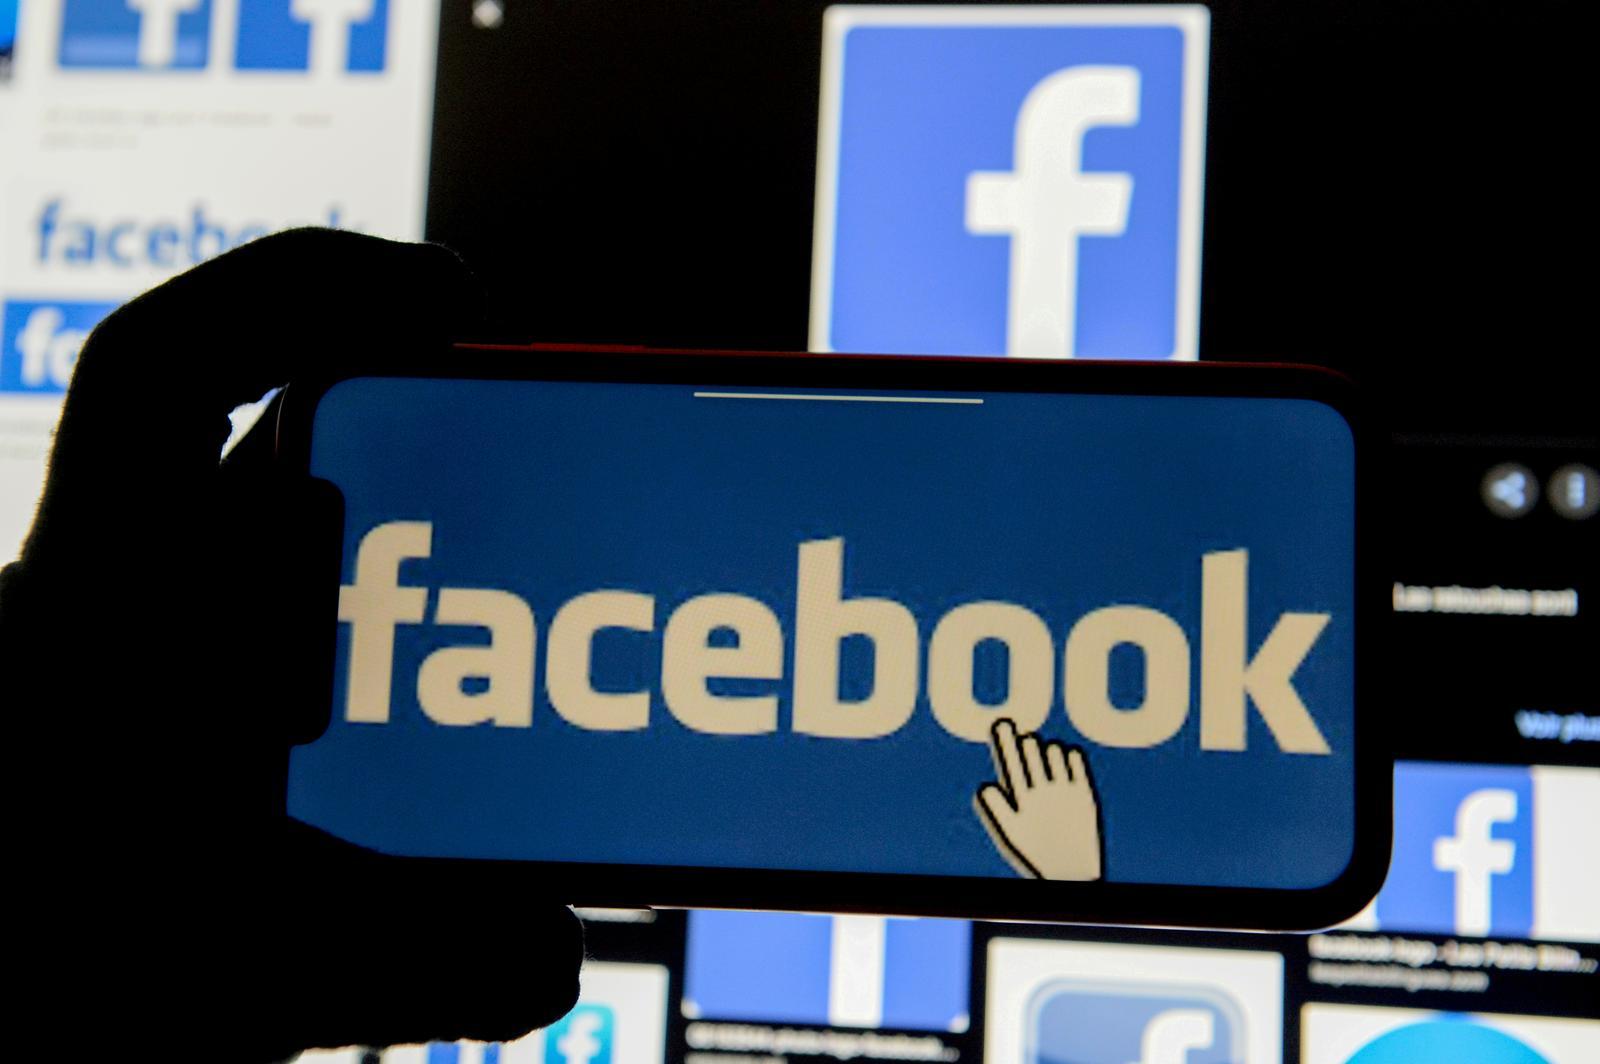 Facebook news goes dark in Australia as content spat escalates